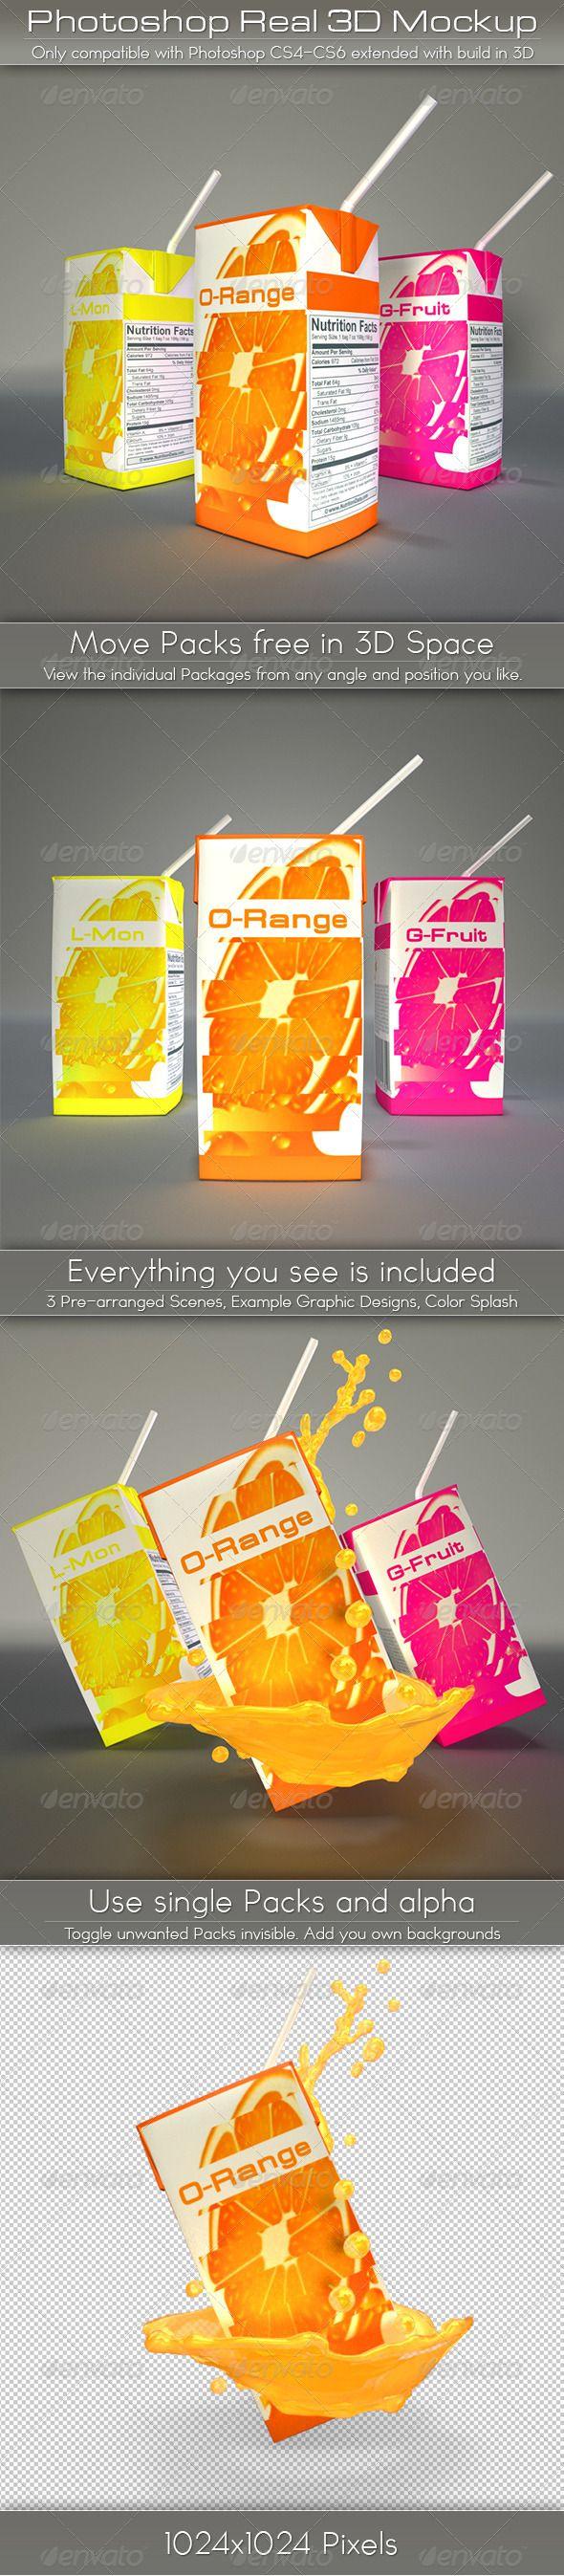 Mini Juice Carton Tetra Pack Mockup — Photoshop PSD #mini #mockup • Available here → https://graphicriver.net/item/mini-juice-carton-tetra-pack-mockup/4611032?ref=pxcr